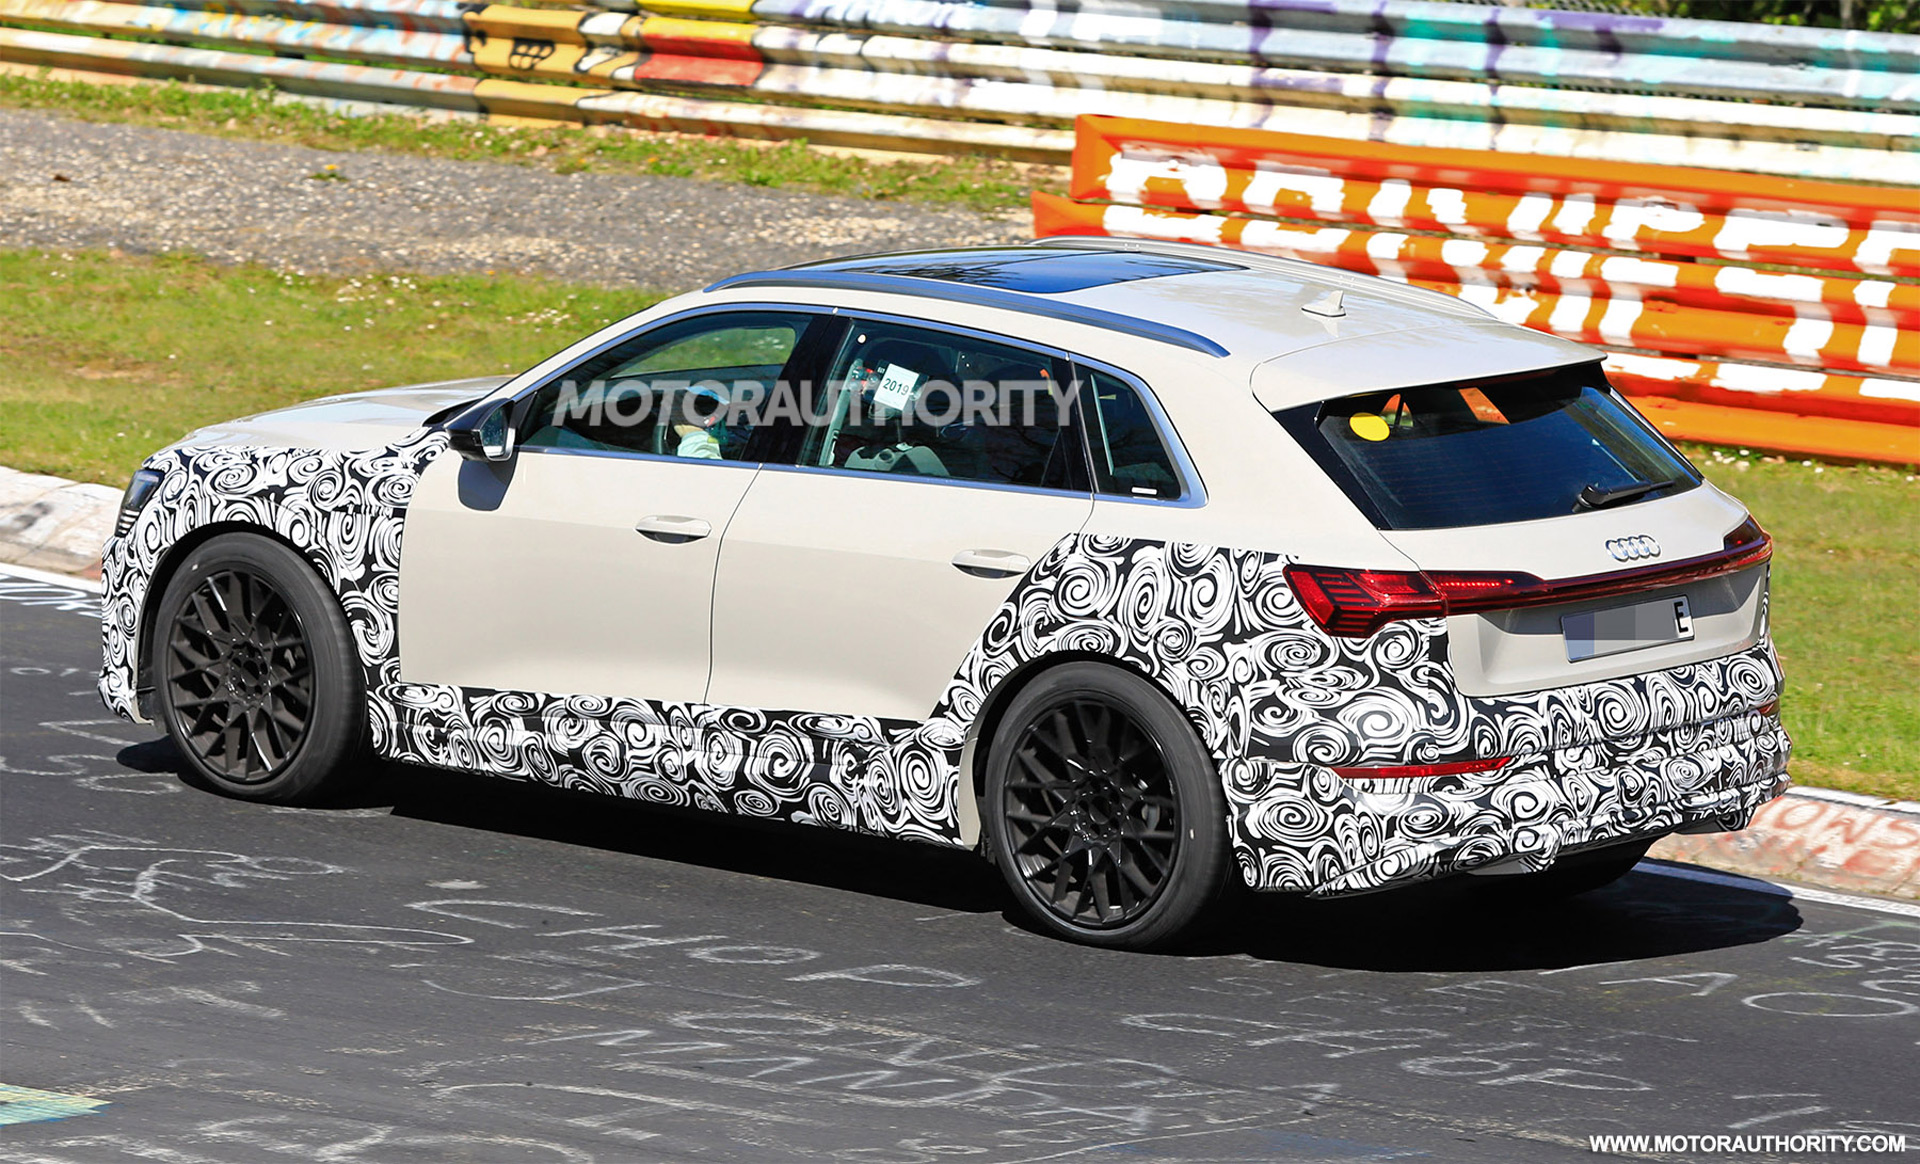 2018 [Audi] E-Tron Quattro - Page 7 2020-audi-e-tron-s-spy-shots--image-via-s-baldauf-sb-medien_100702344_h